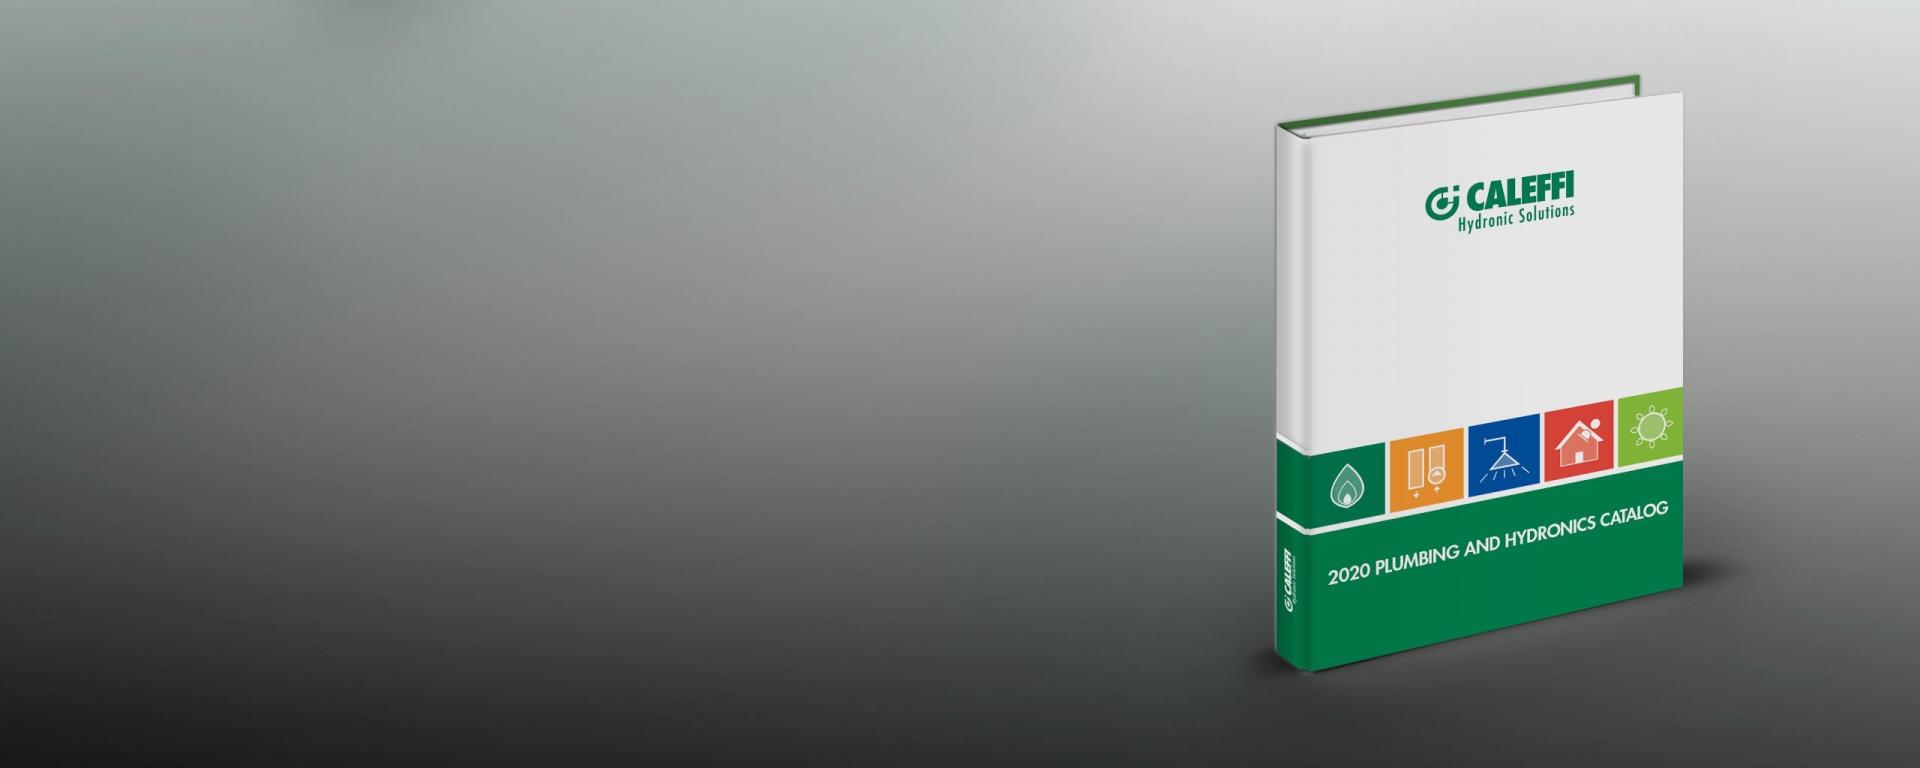 Caleffi 2020 Plumbing and Hydronics Catalog